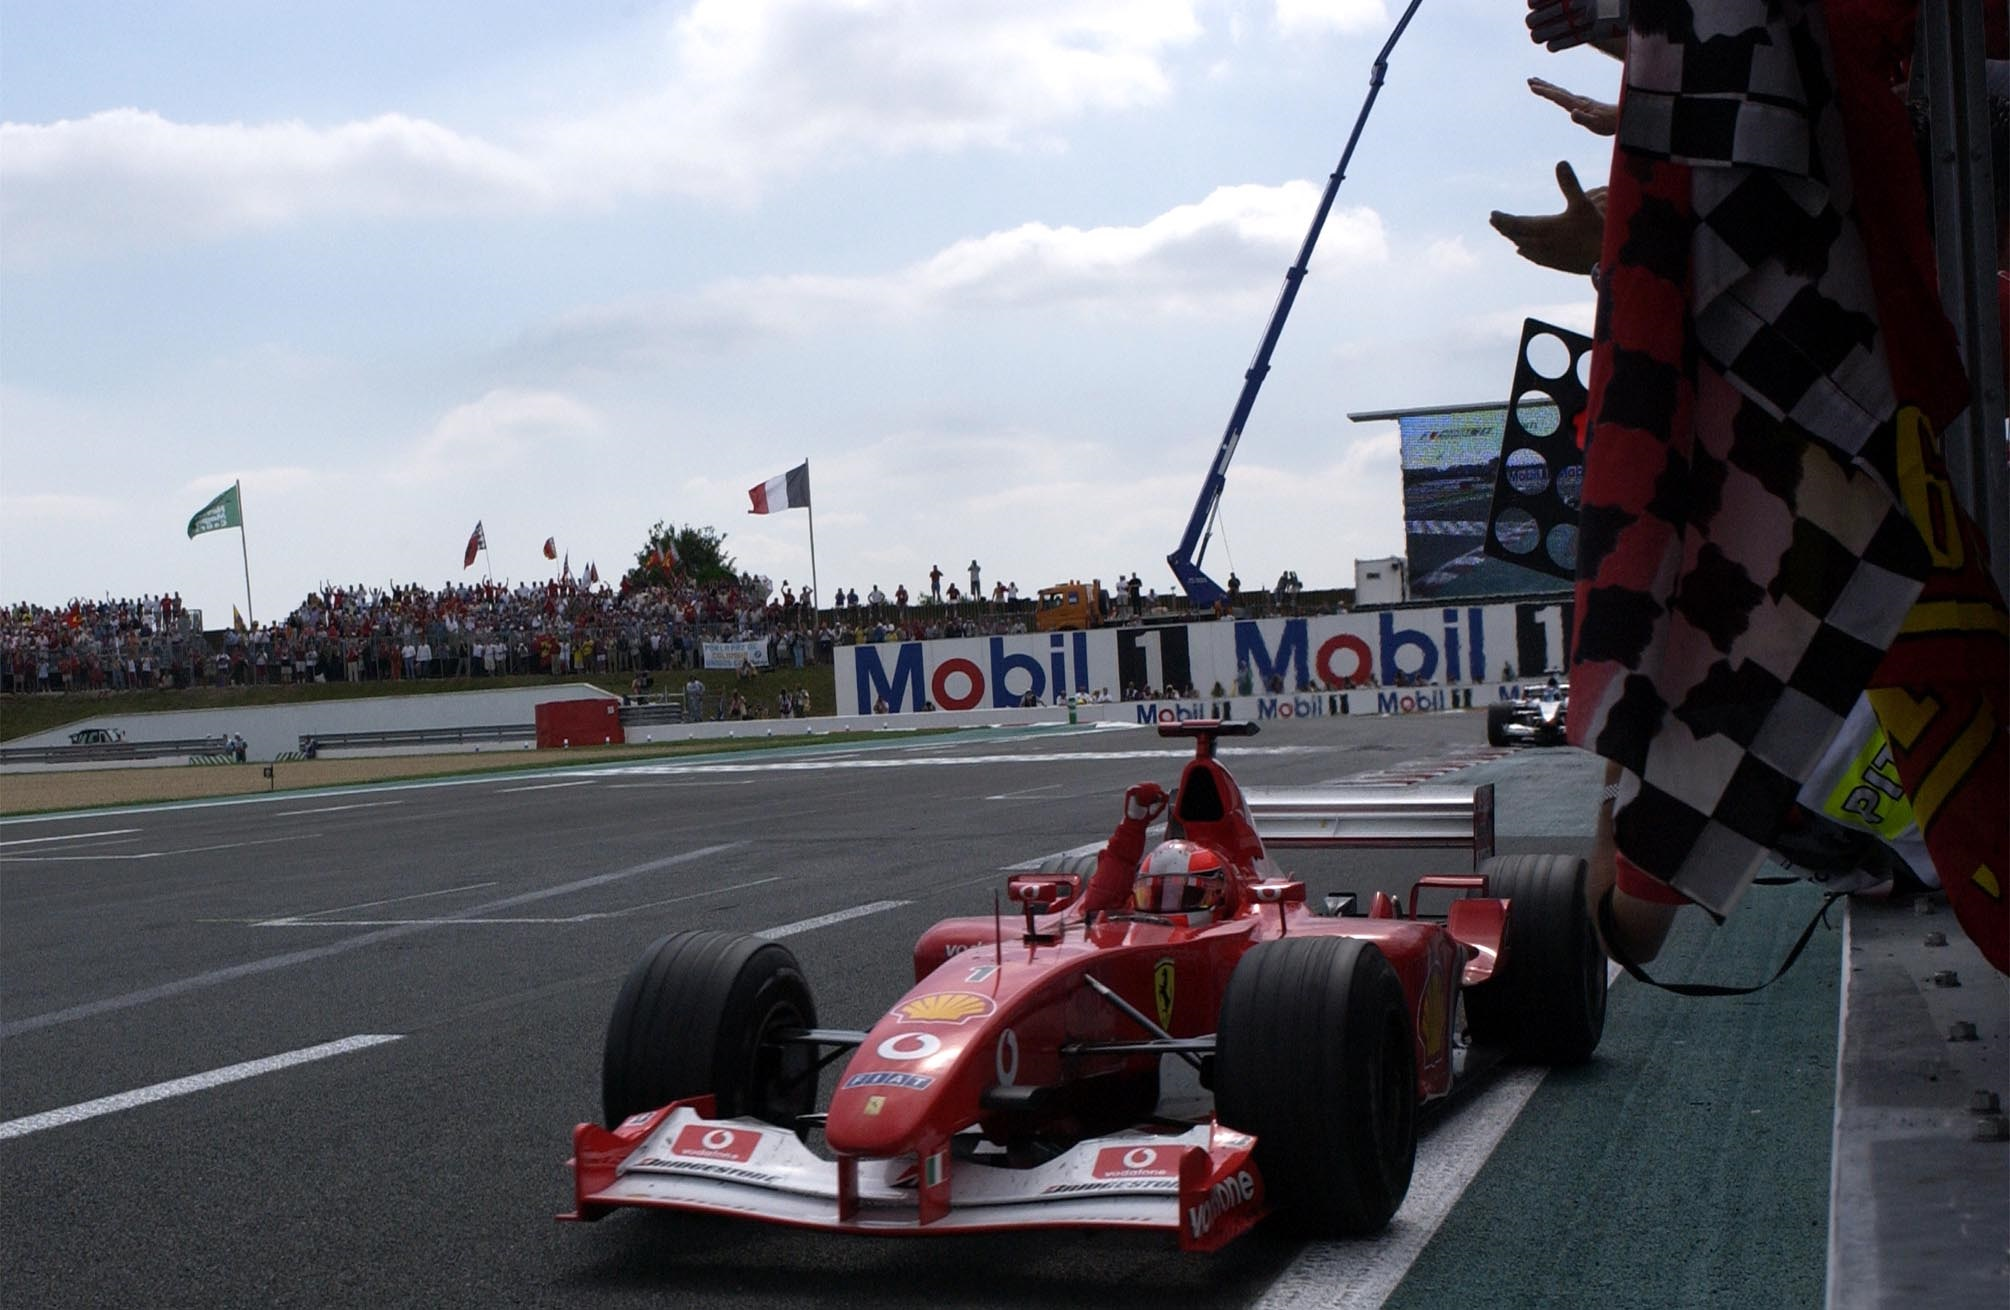 Michael Schumacher Ferrari F2002 France GP F1 2002 crosses the line Foto Ferrari